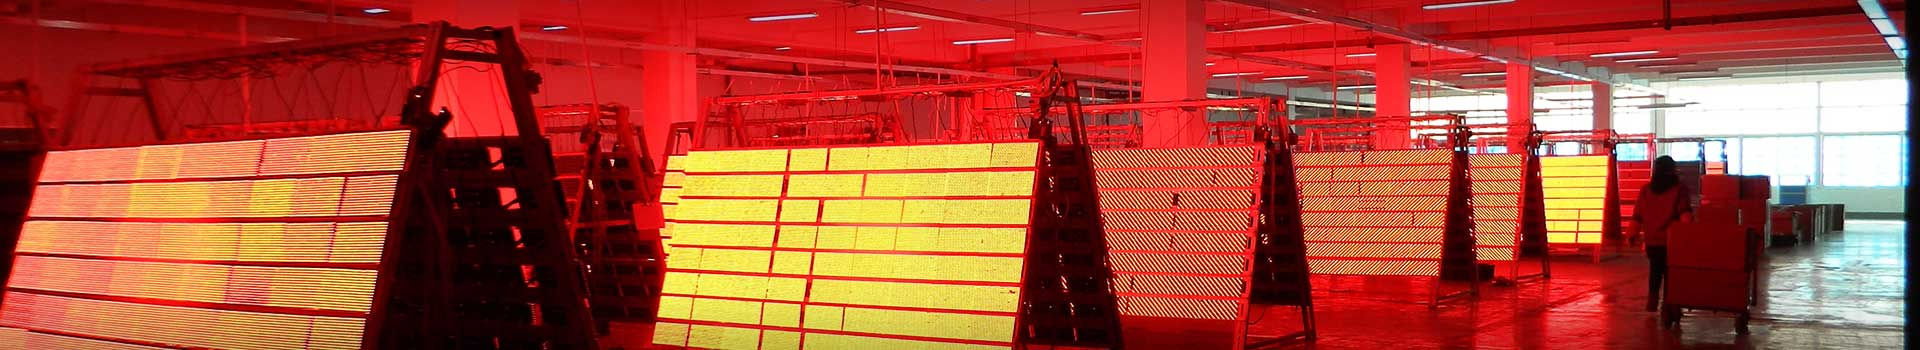 LED室内显示屏